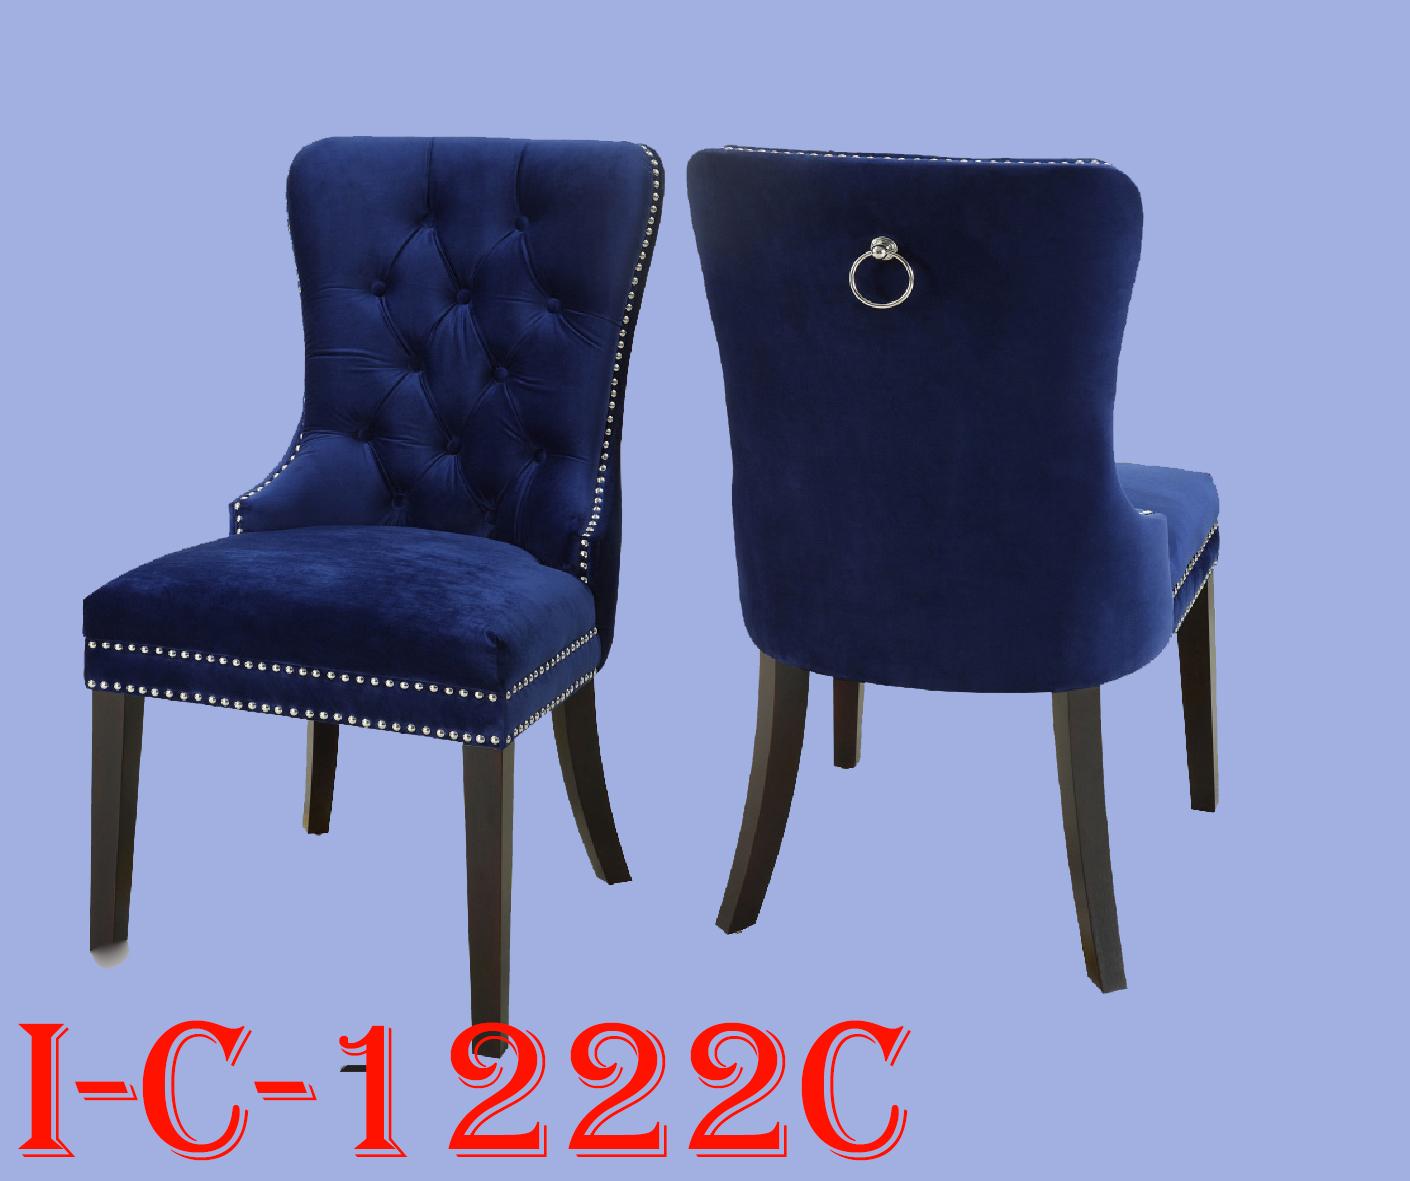 I-C-1222C